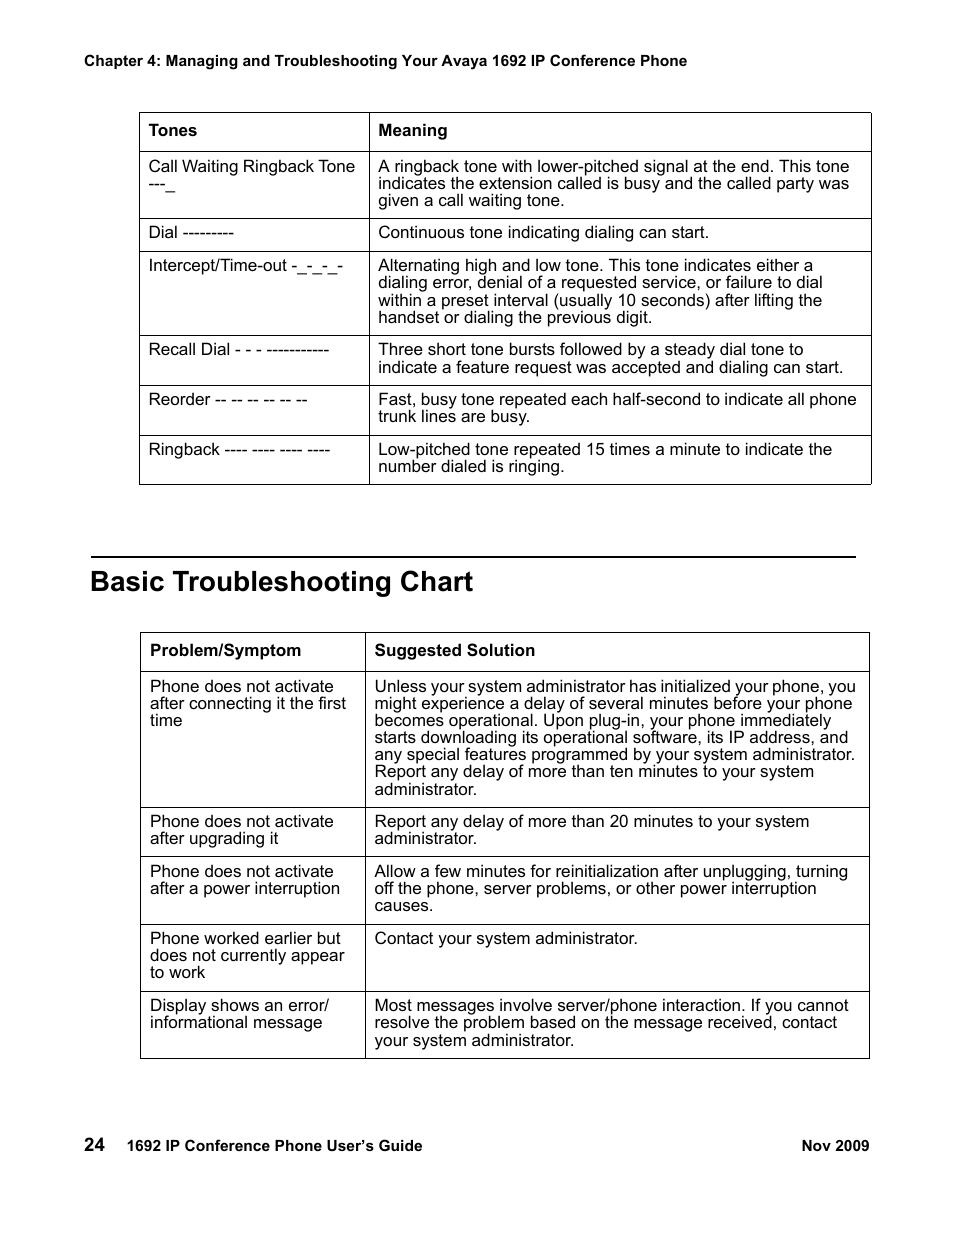 basic troubleshooting chart avaya 1692 ip user manual page 24 32 rh manualsdir com Avaya Phone User Guide Avaya Phone User Guide